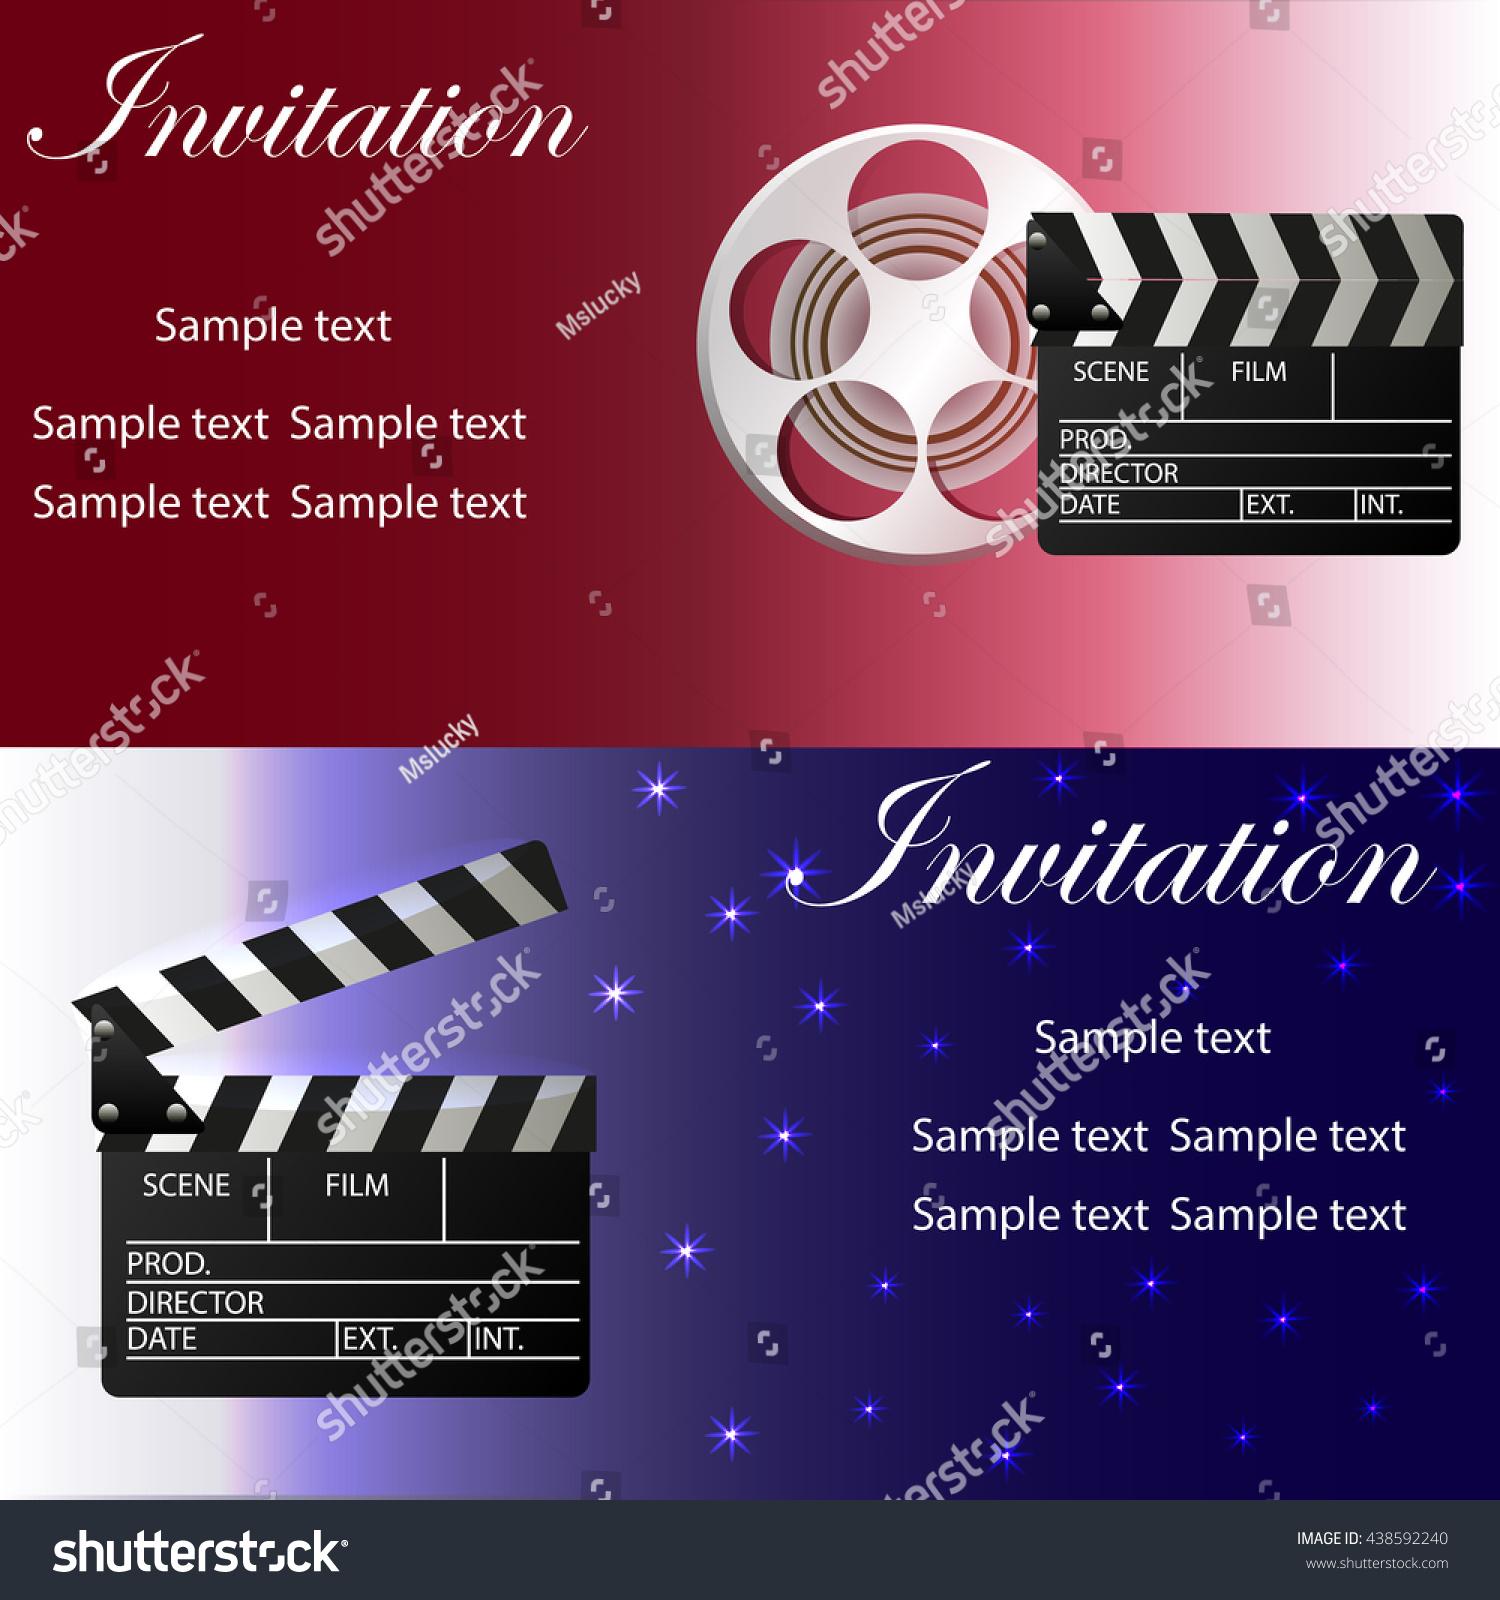 Movie concept template movie clapper movie stock photo photo movie concept template with movie clapper movie reel two variants of invitation stopboris Gallery